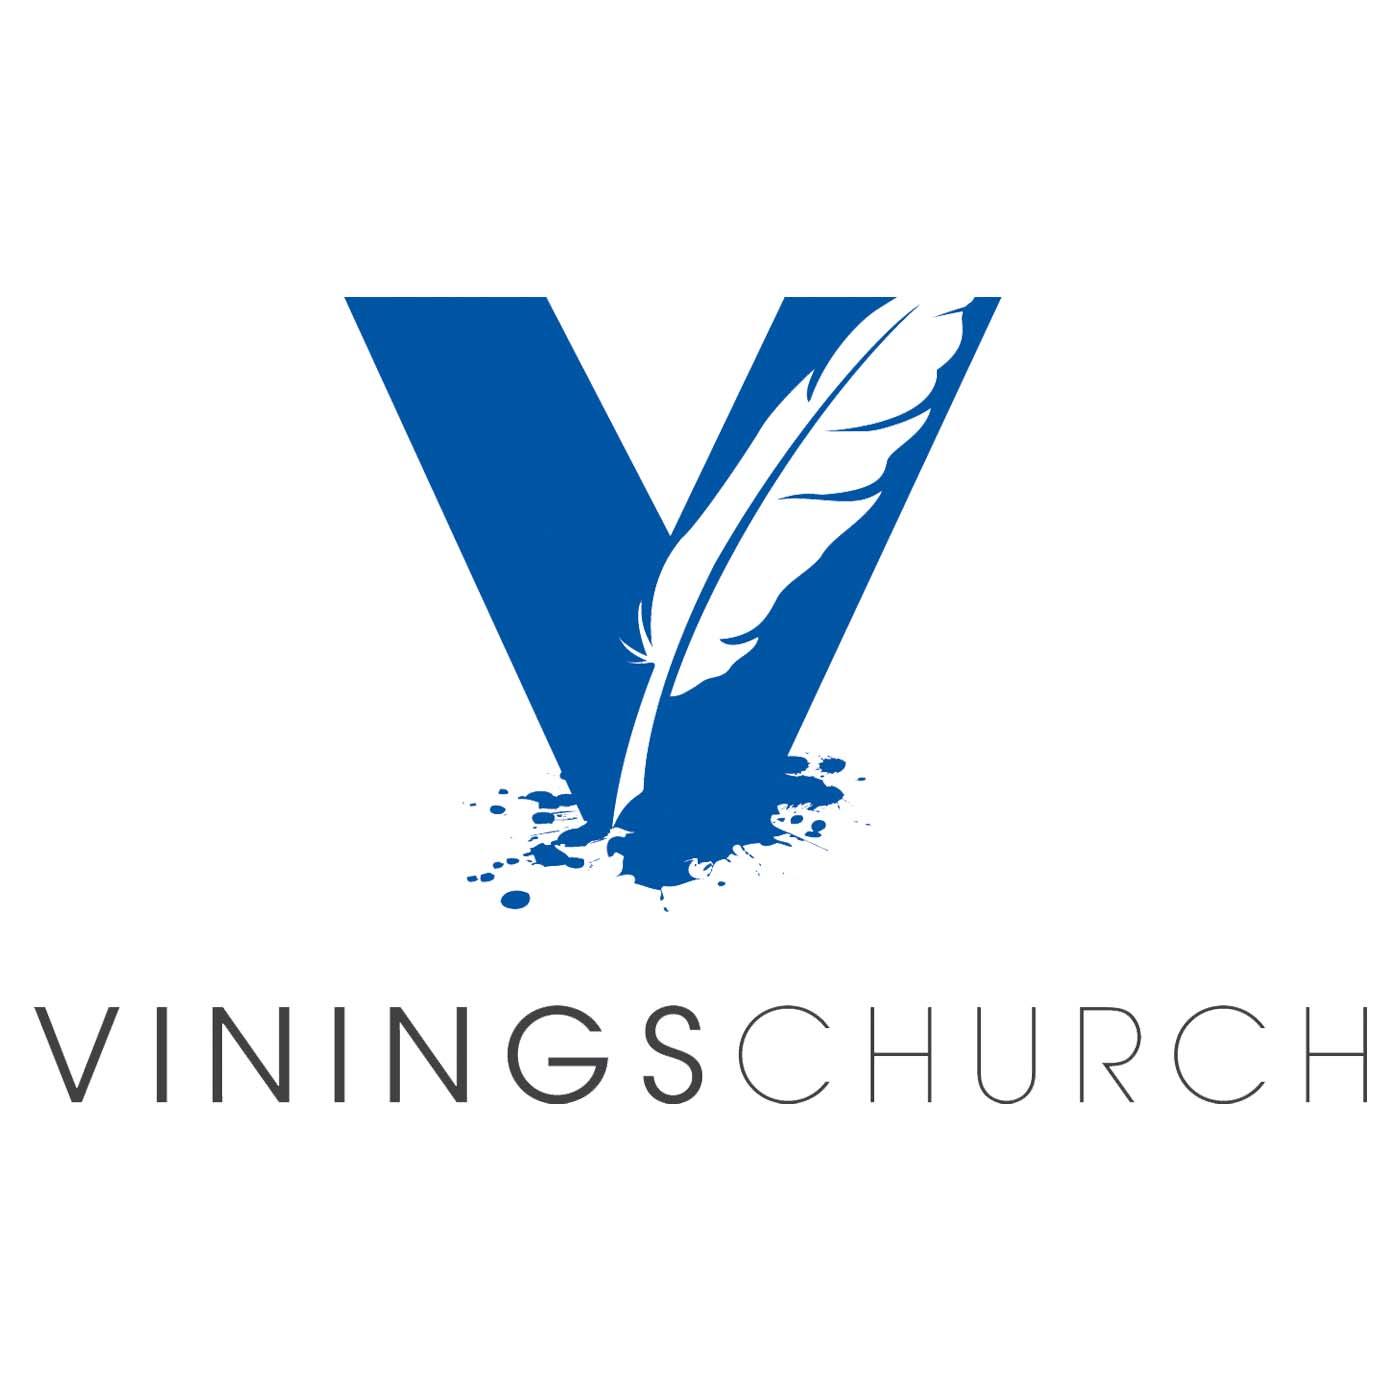 Vinings Church